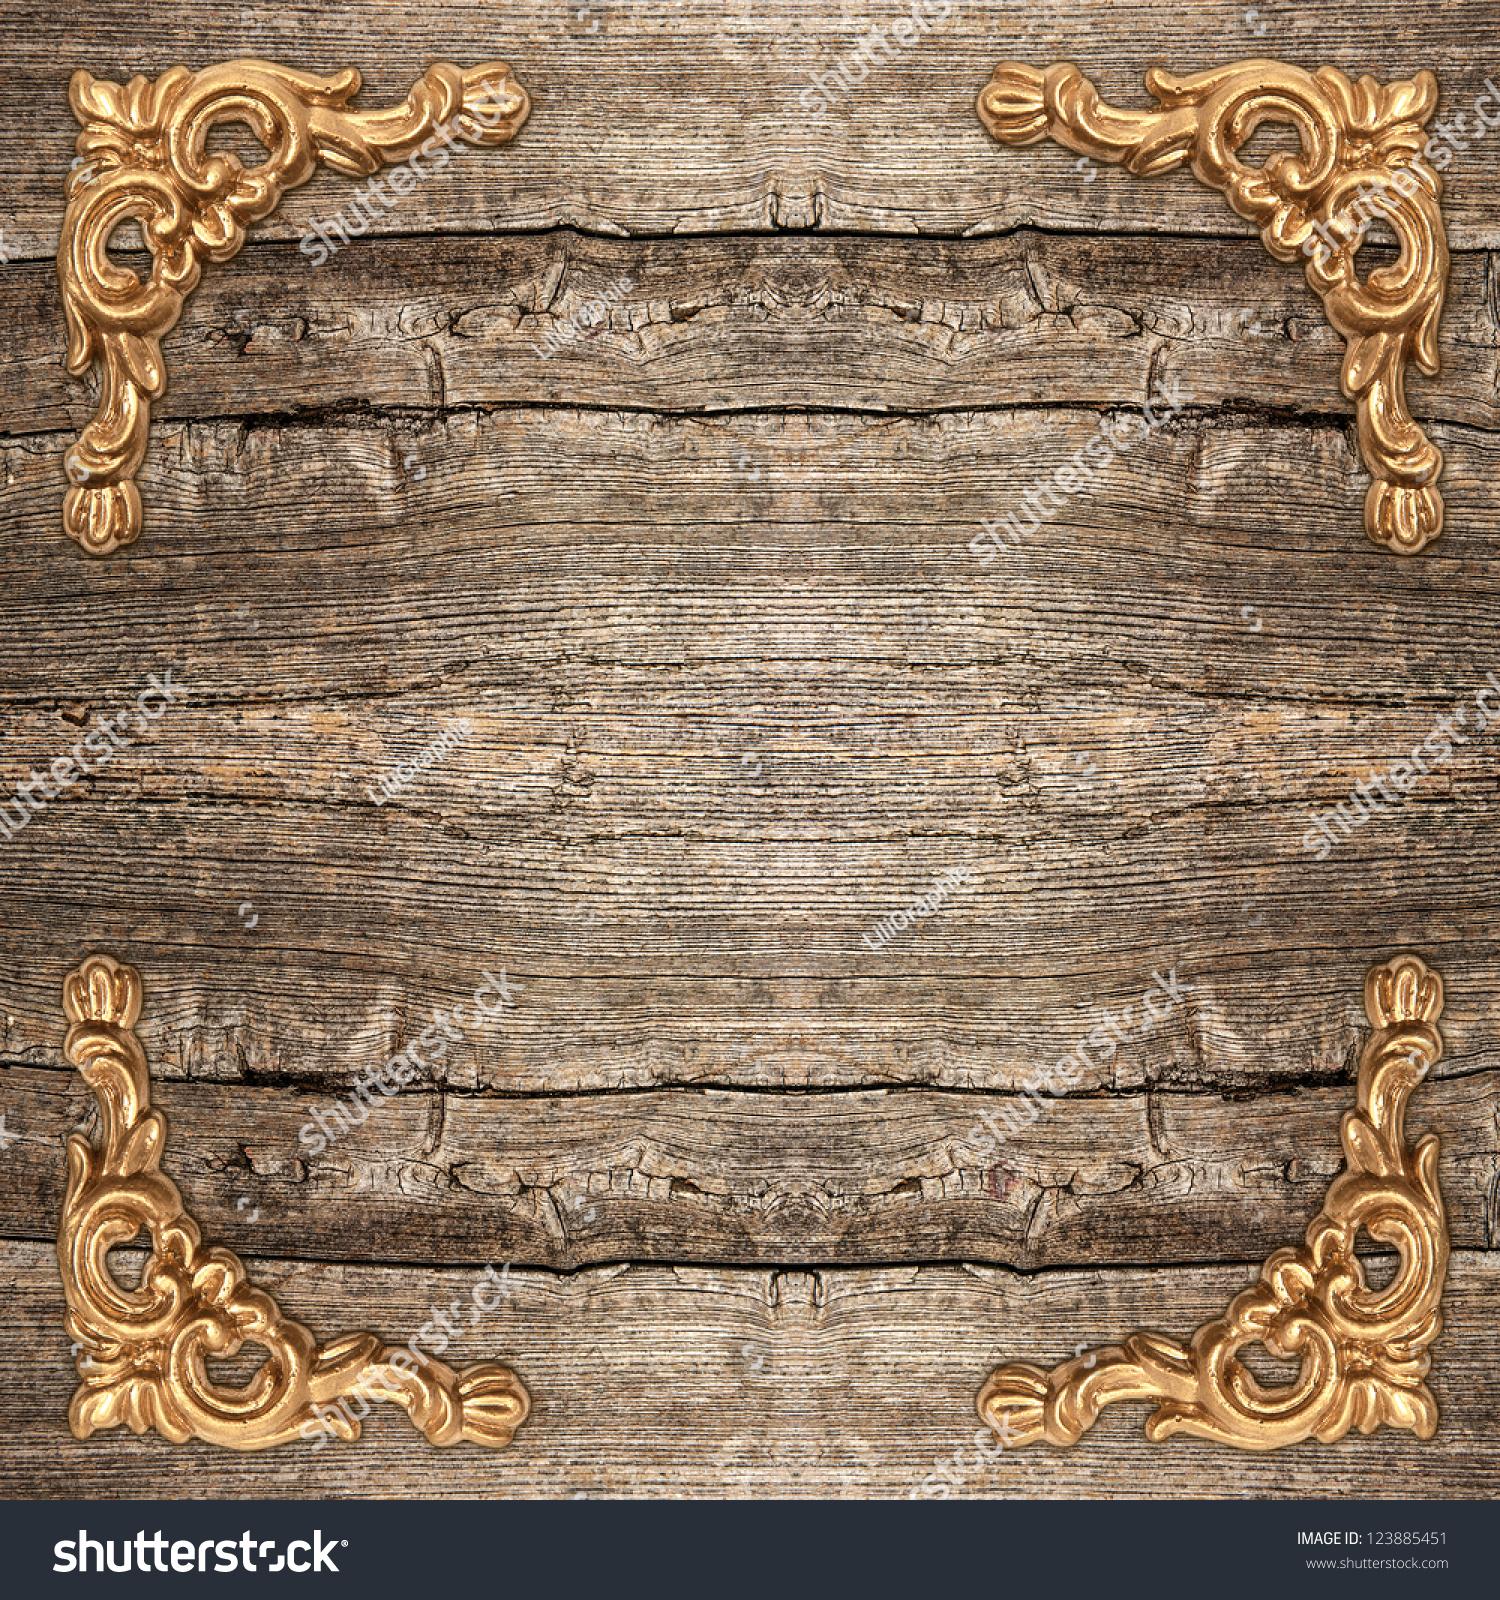 Rustic Wooden Background Golden Corner Vintage Stock Photo